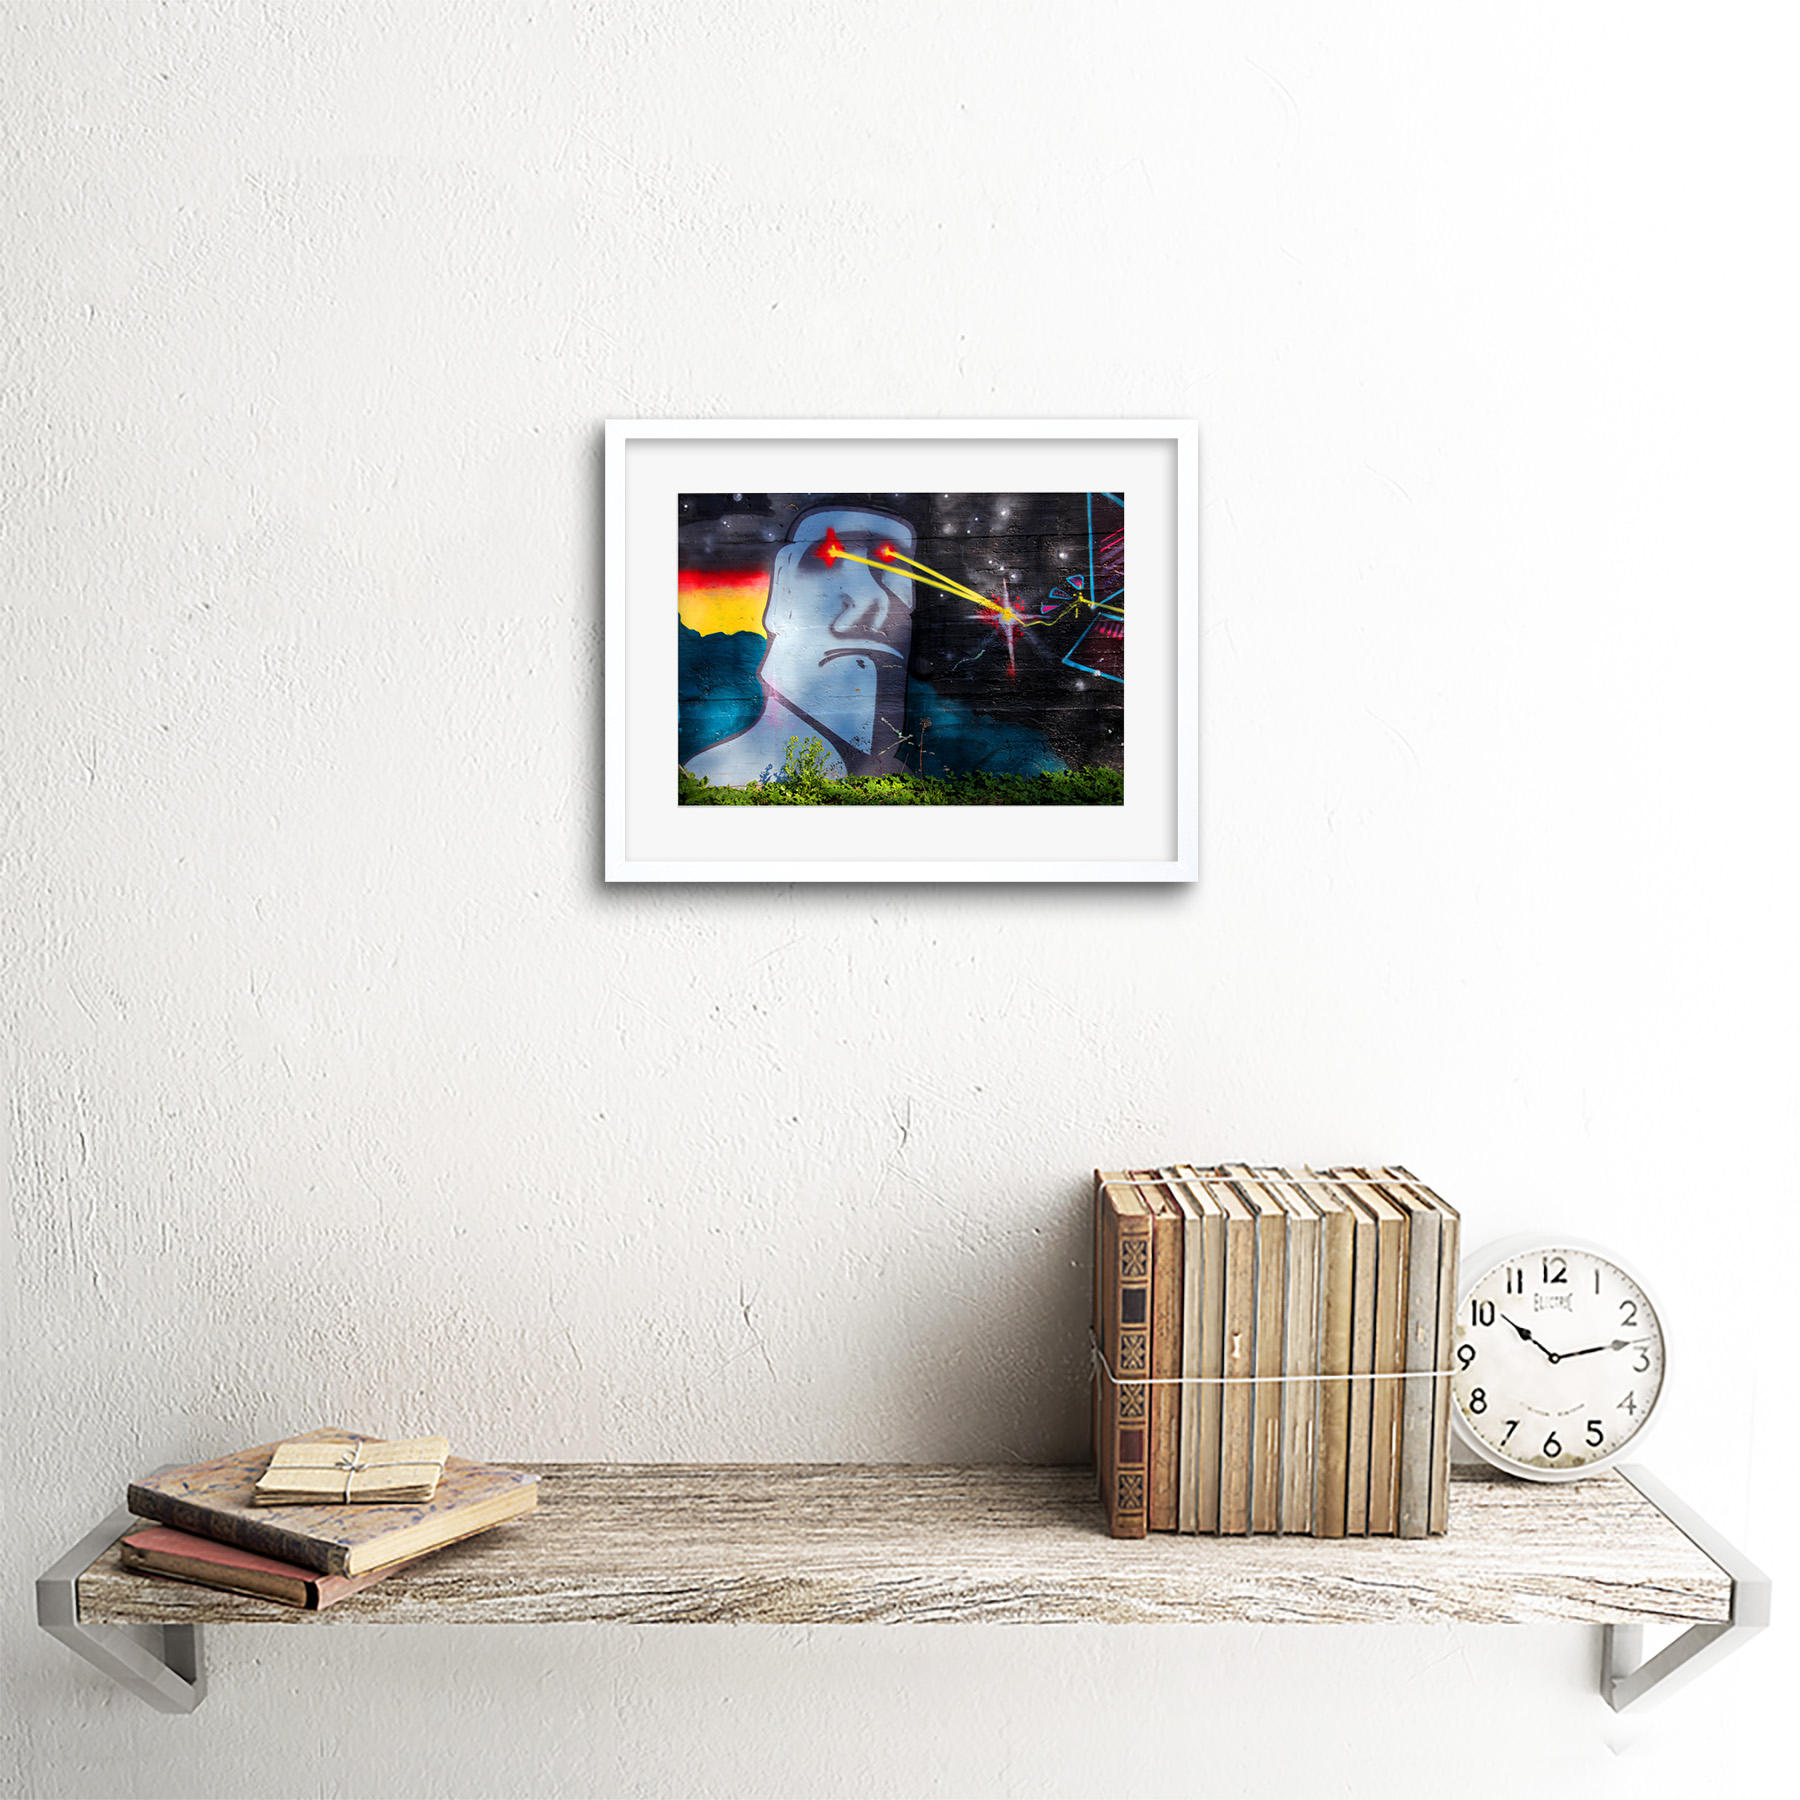 Graffiti-Easter-Island-Head-Laser-Art-Print-Framed-Poster-Wall-Decor miniature 18